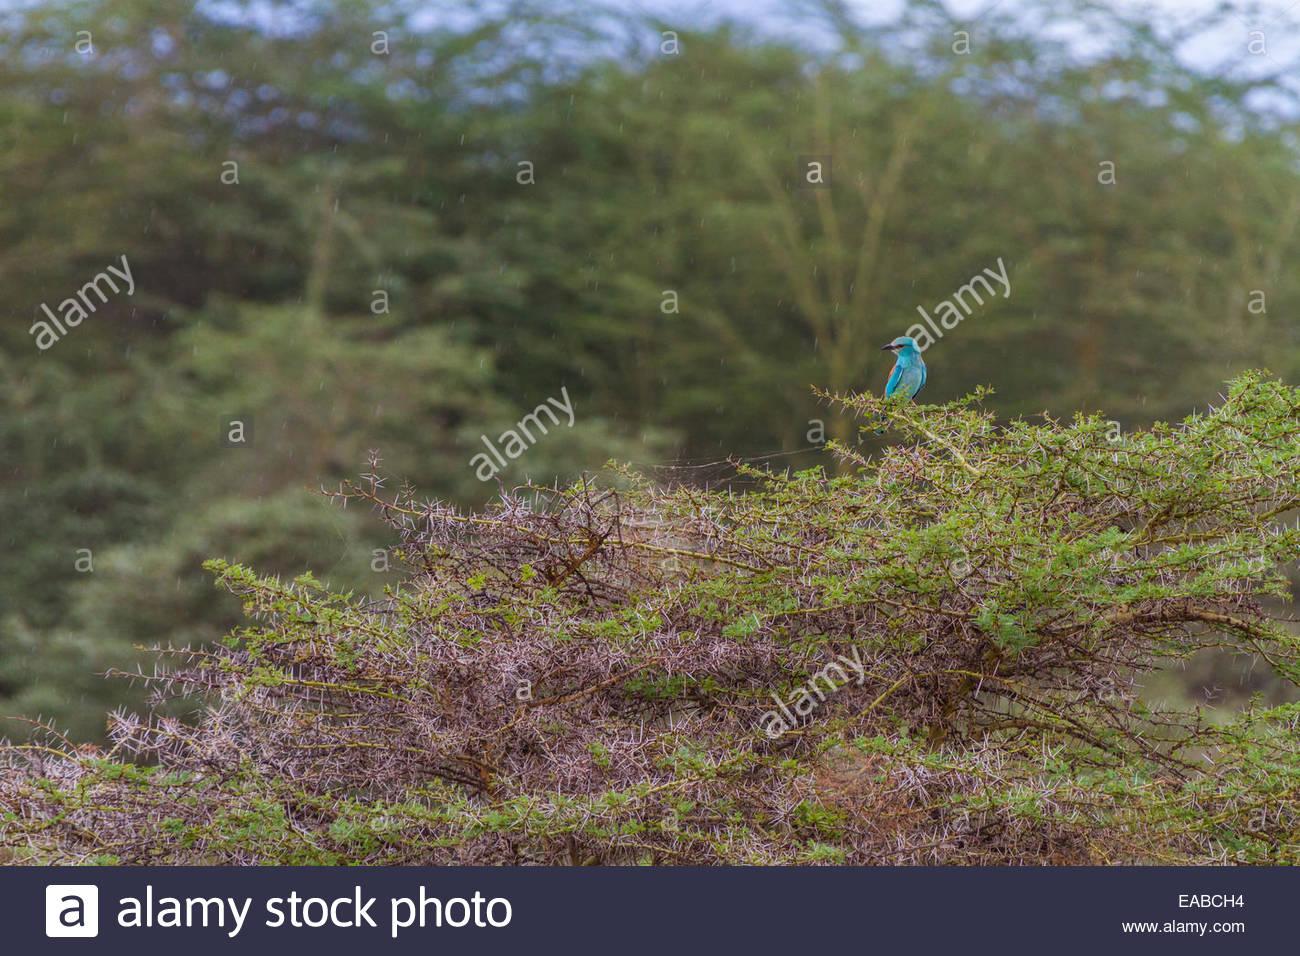 Bird perching on thorny bush - East Africa - Tanzania - Stock Image